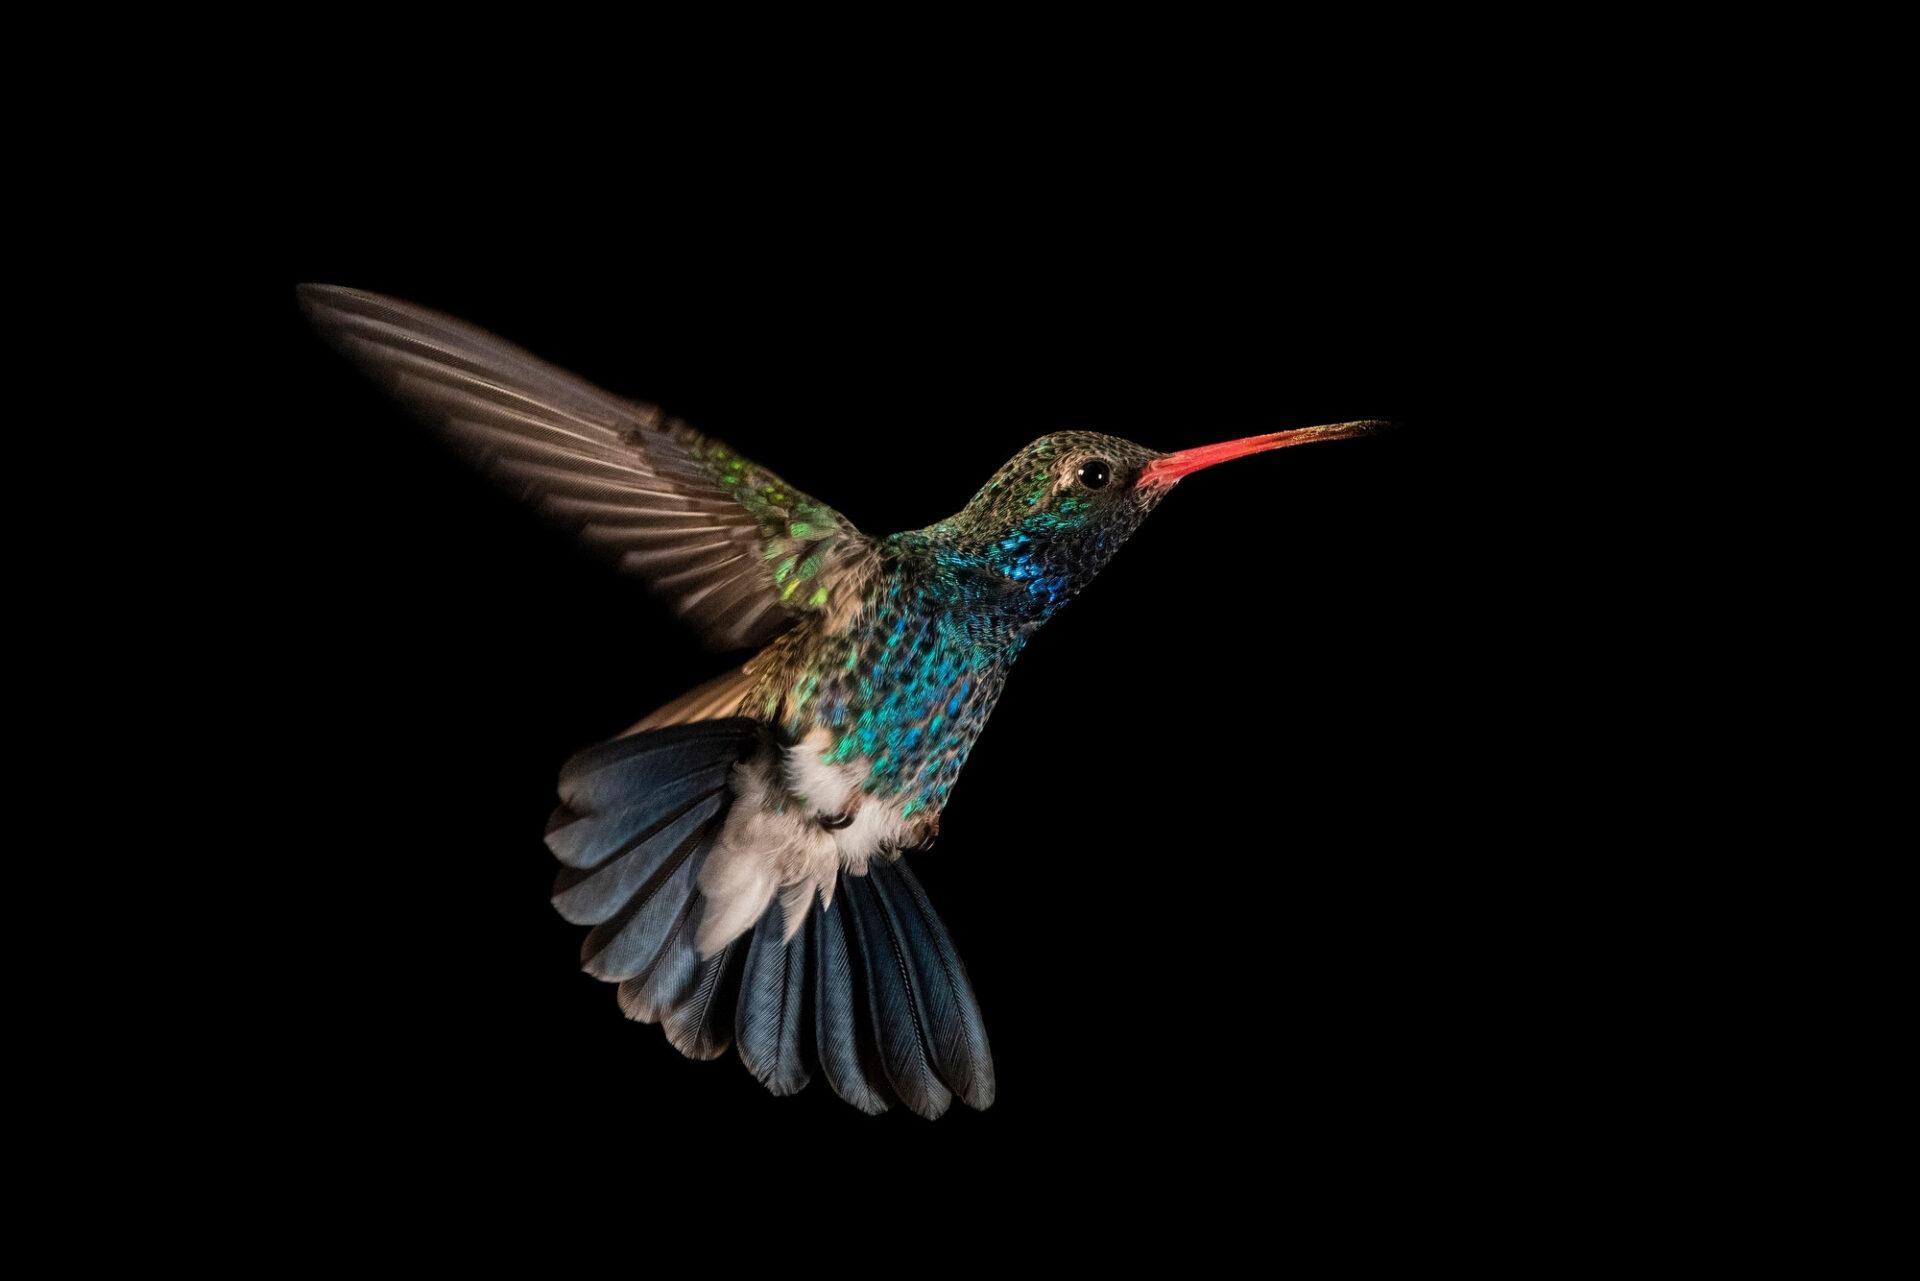 Photo: Male broad-billed hummingbird (Cynanthus latirostris) at the Omaha Zoo.